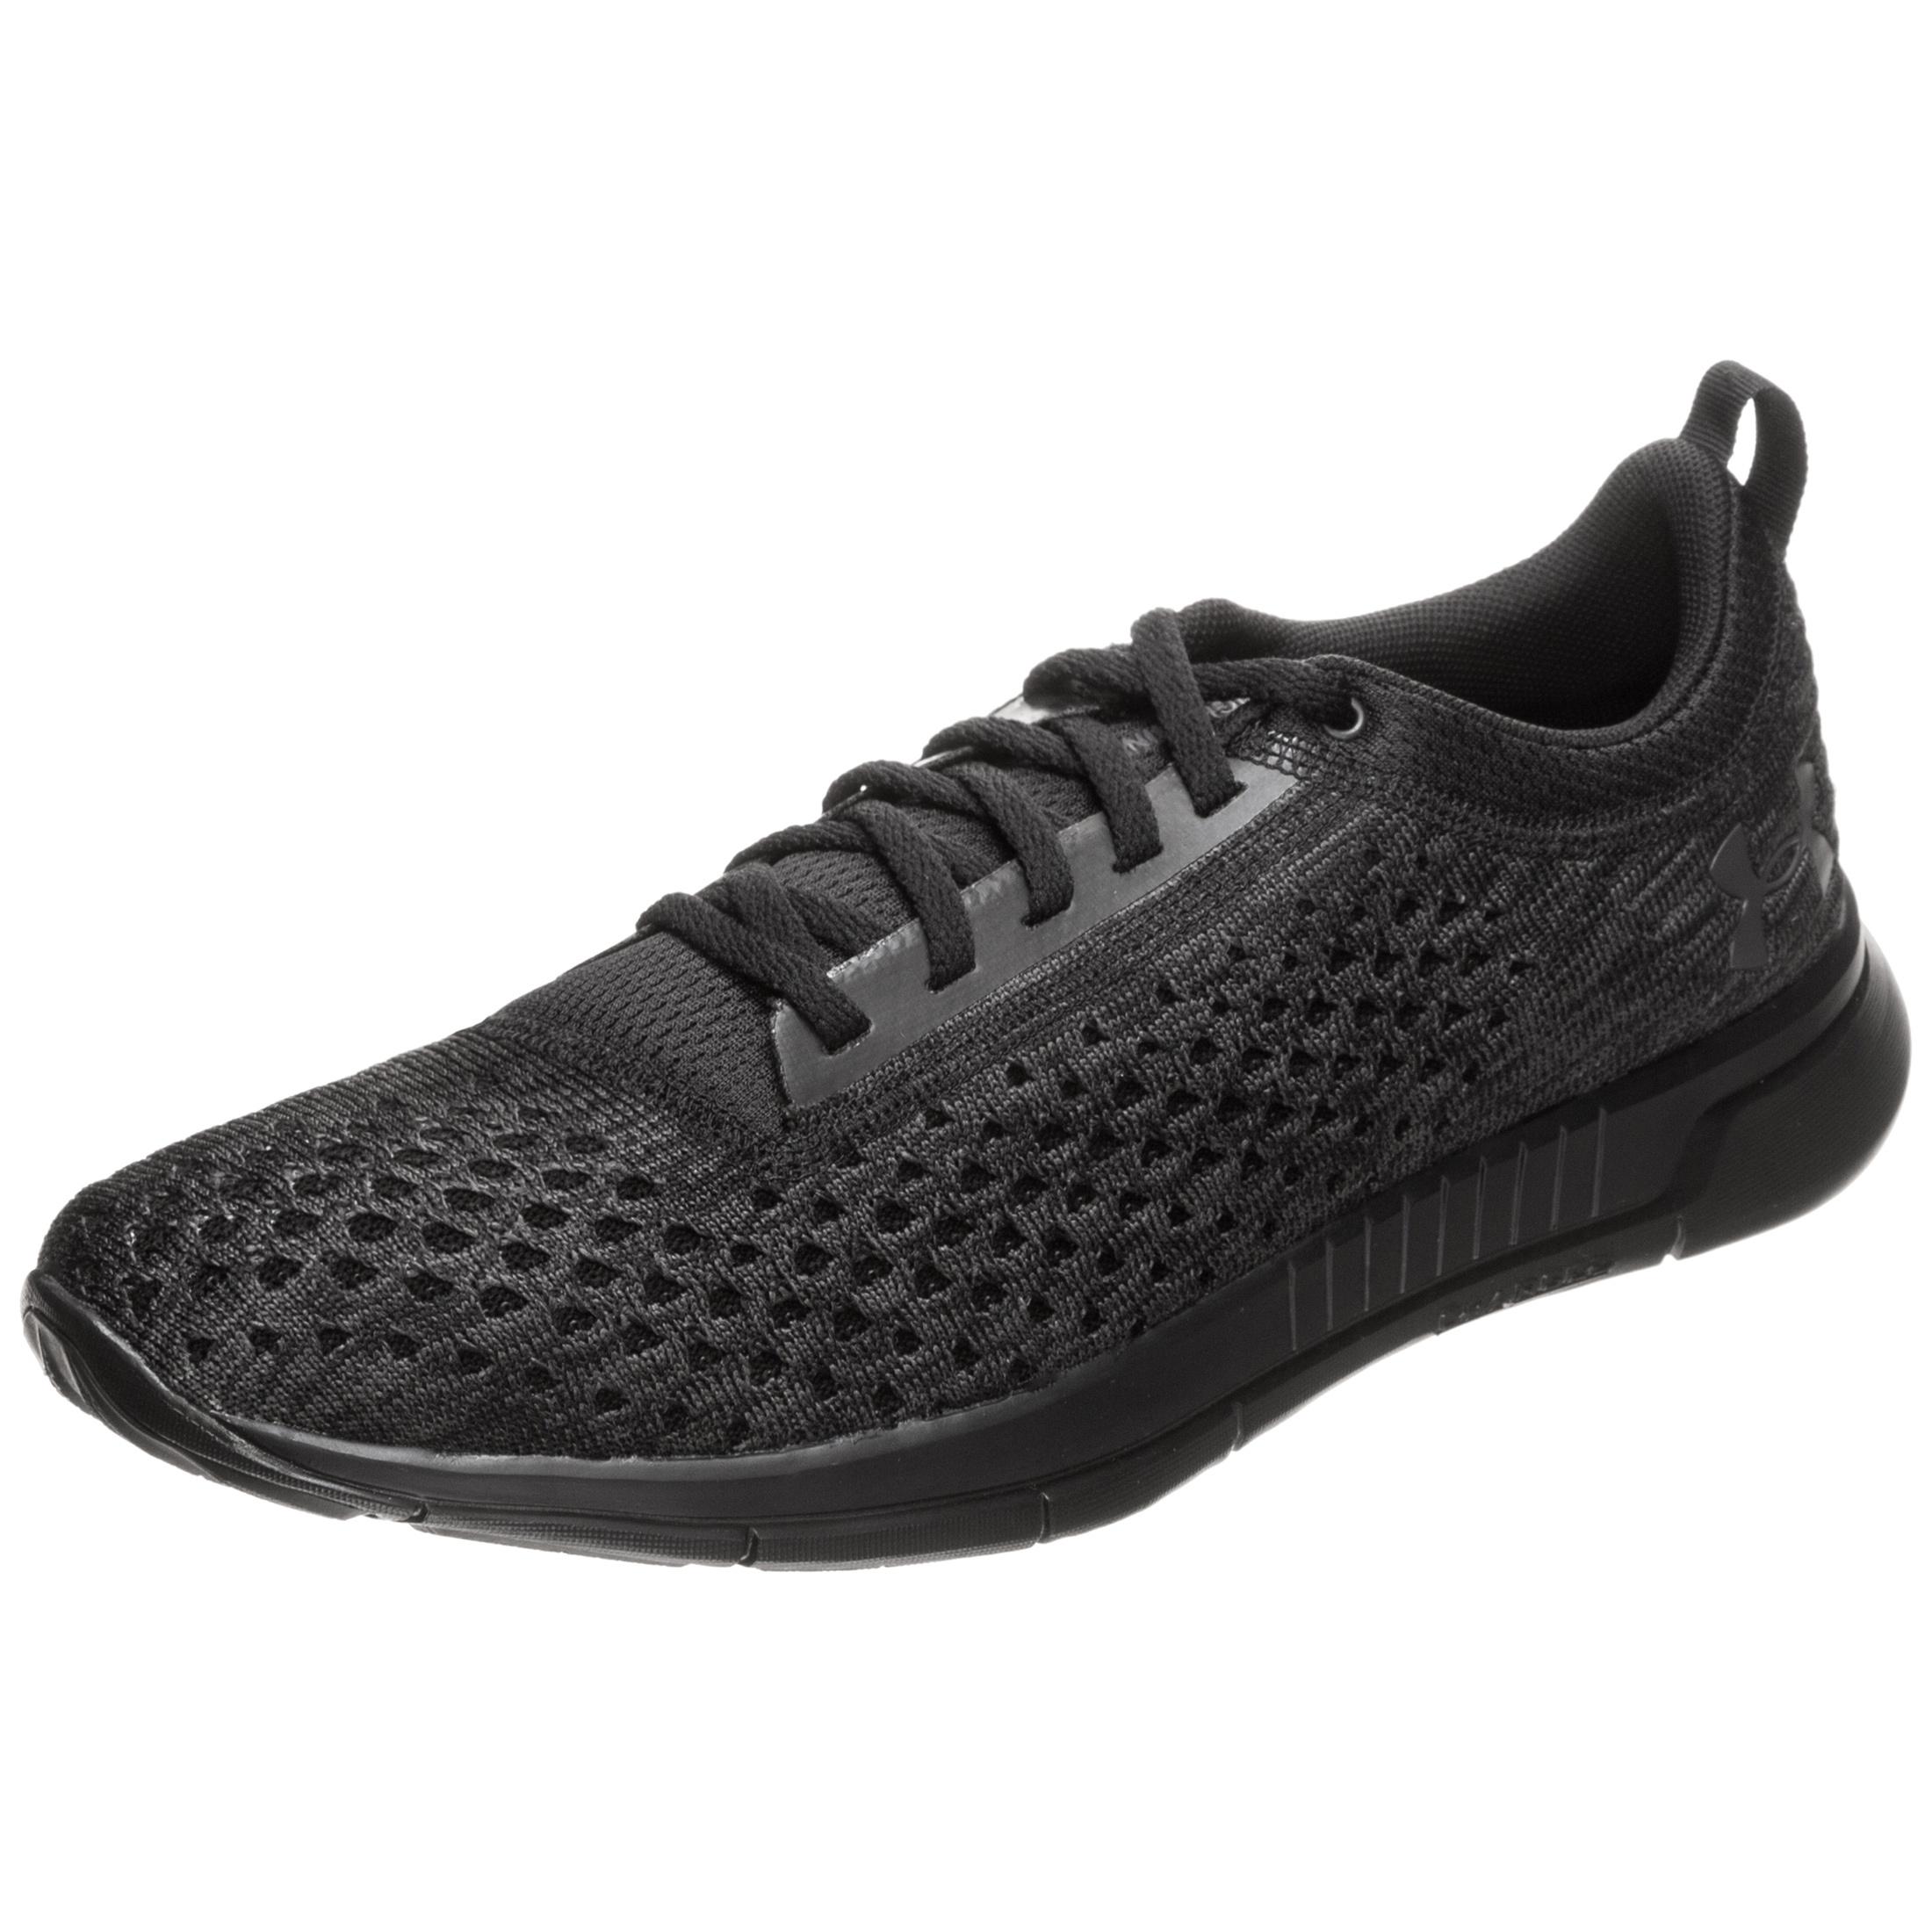 04214a1aab Herrenschuhe Under Armour Lightning 2 Black Gray Men Running Shoes Sneakers  3000013-100 SZ 10